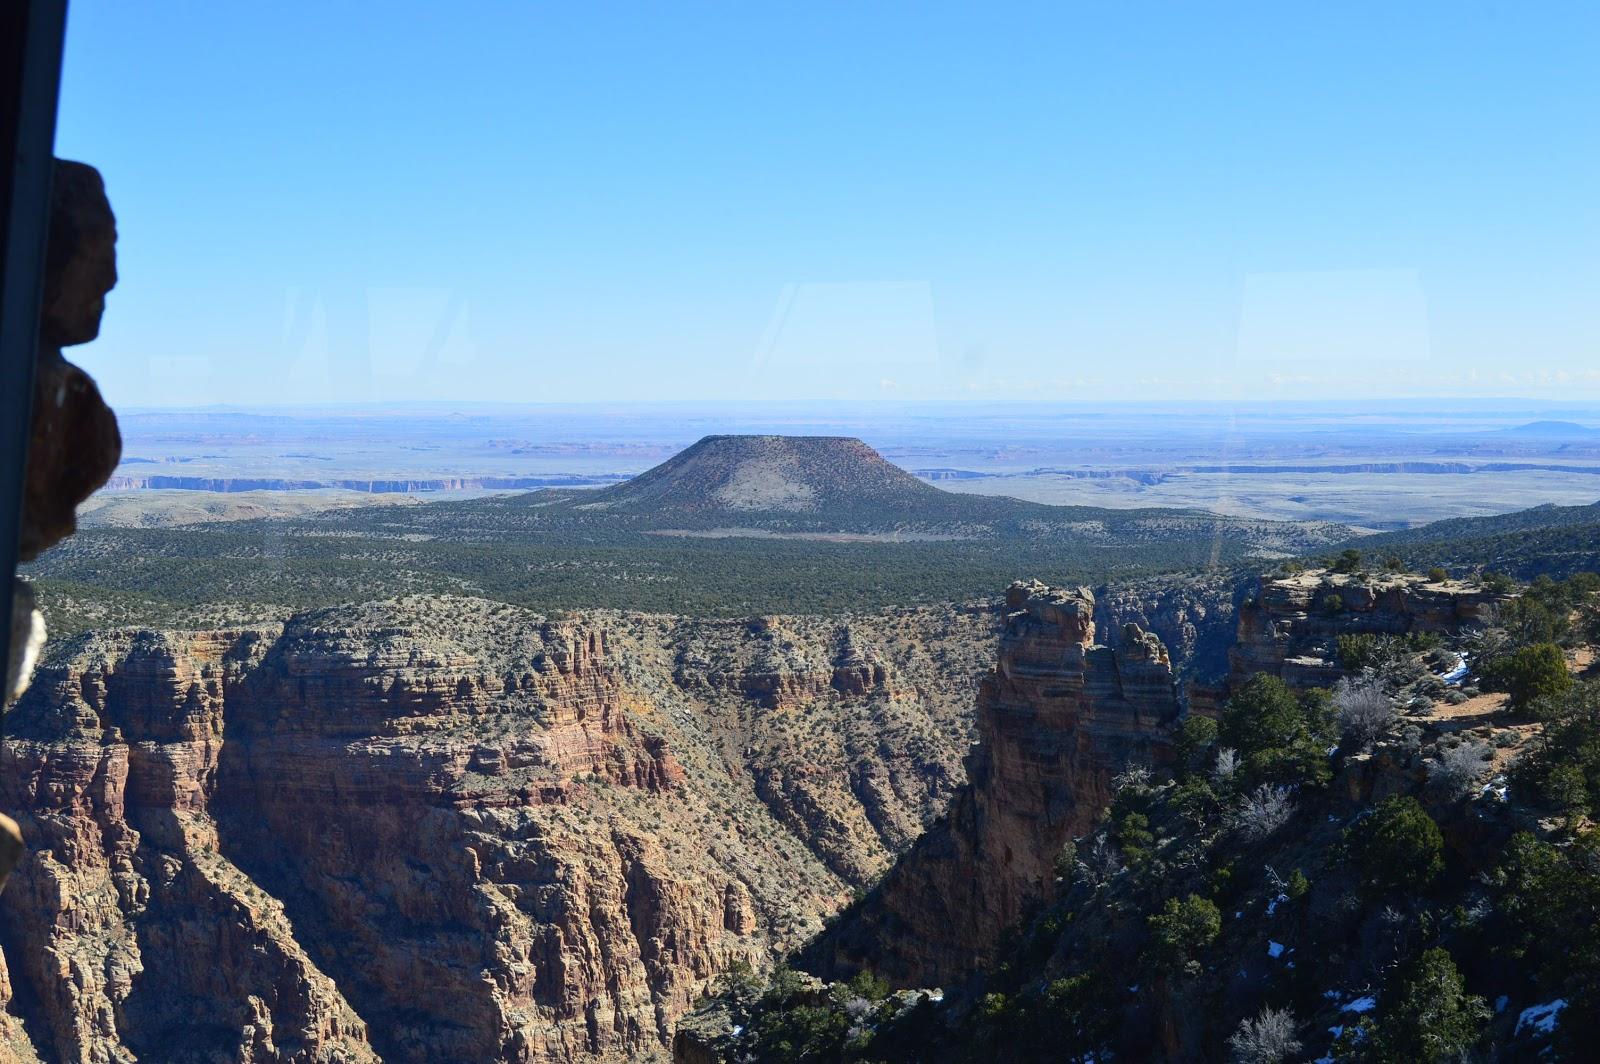 Salman Aslam On The Precipice Of Grand Canyon Arizona